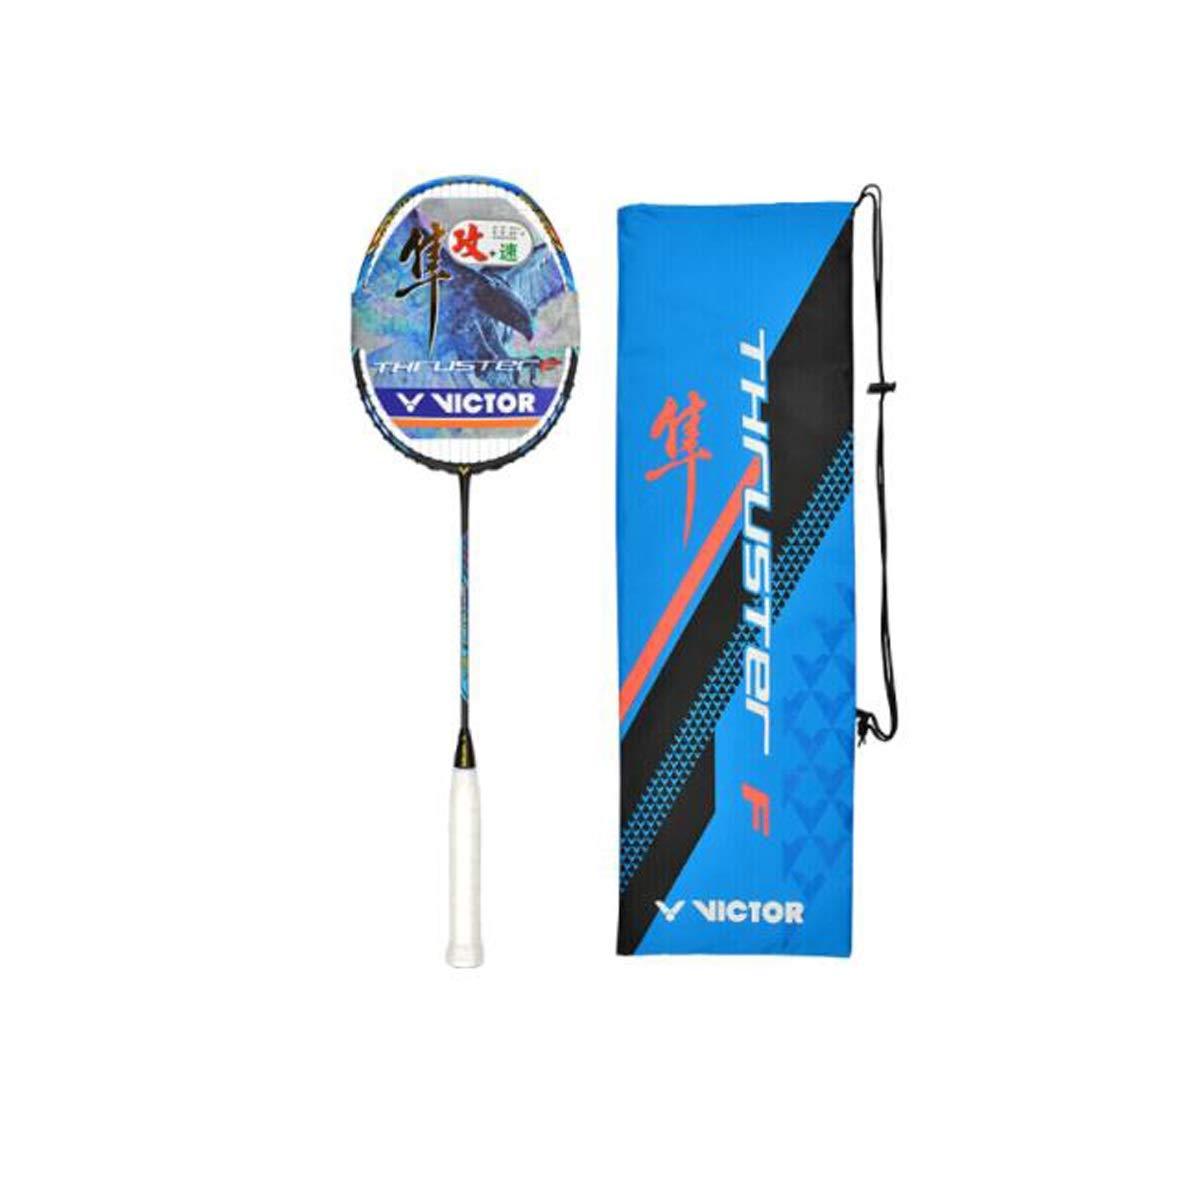 8HAOWENJU バドミントンラケット、攻撃的フルカーボンバドミントンラケット、シングルショットTK-F隼4U(プロ選手用ラケット) 厳選された B07SVVQXF2 4U